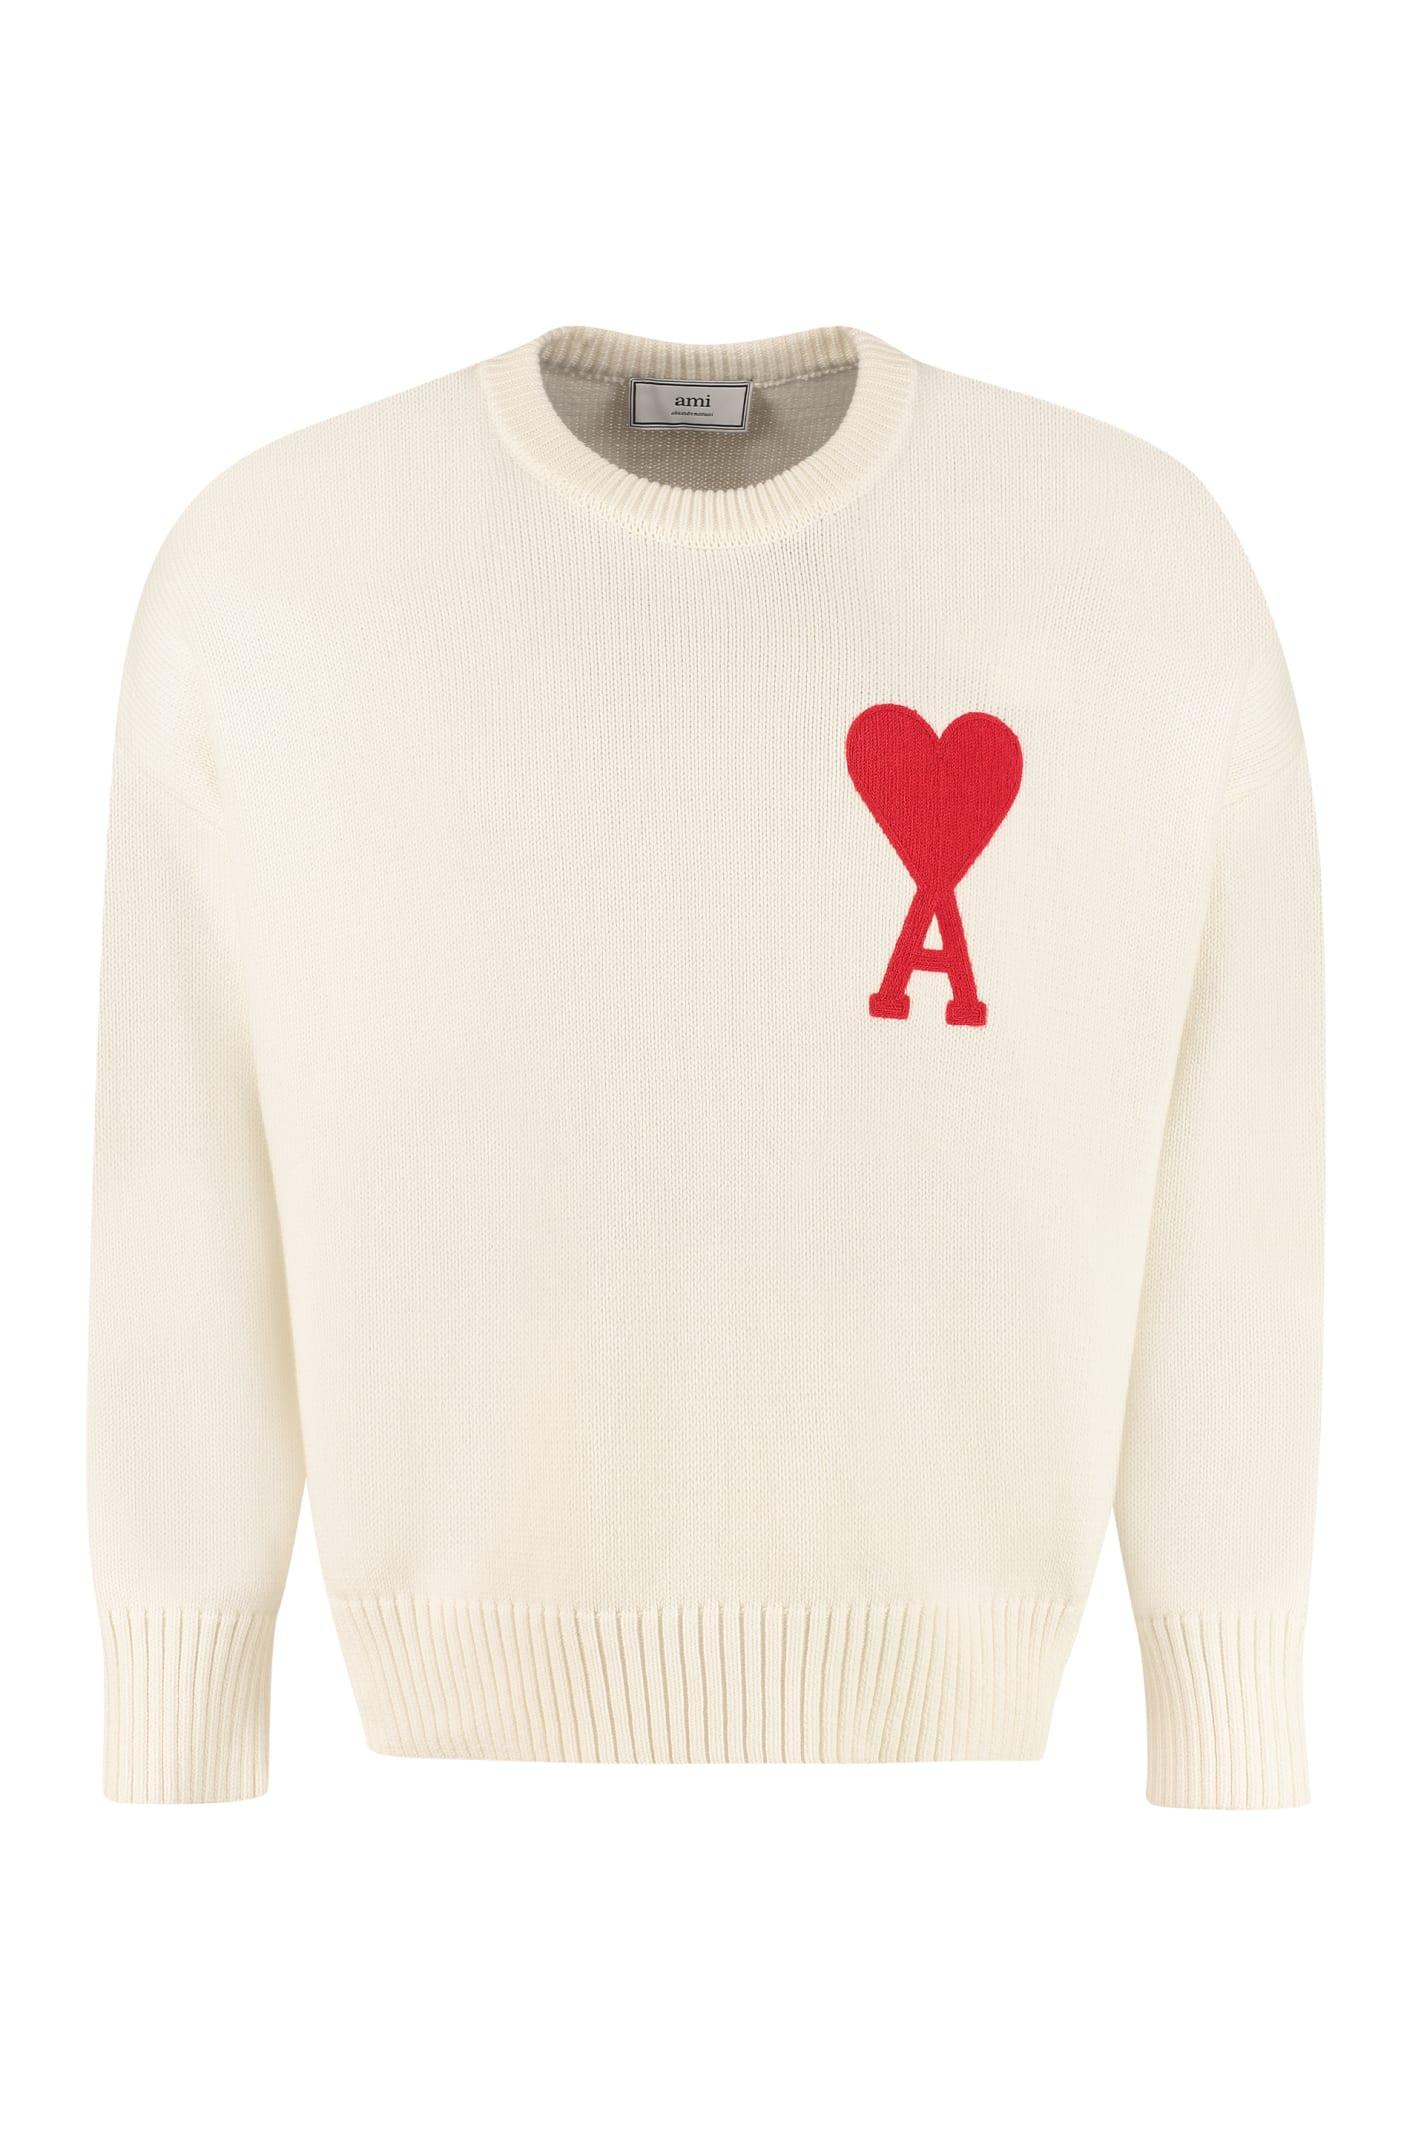 Ami Alexandre Mattiussi Cotton Blend Crew-neck Sweater